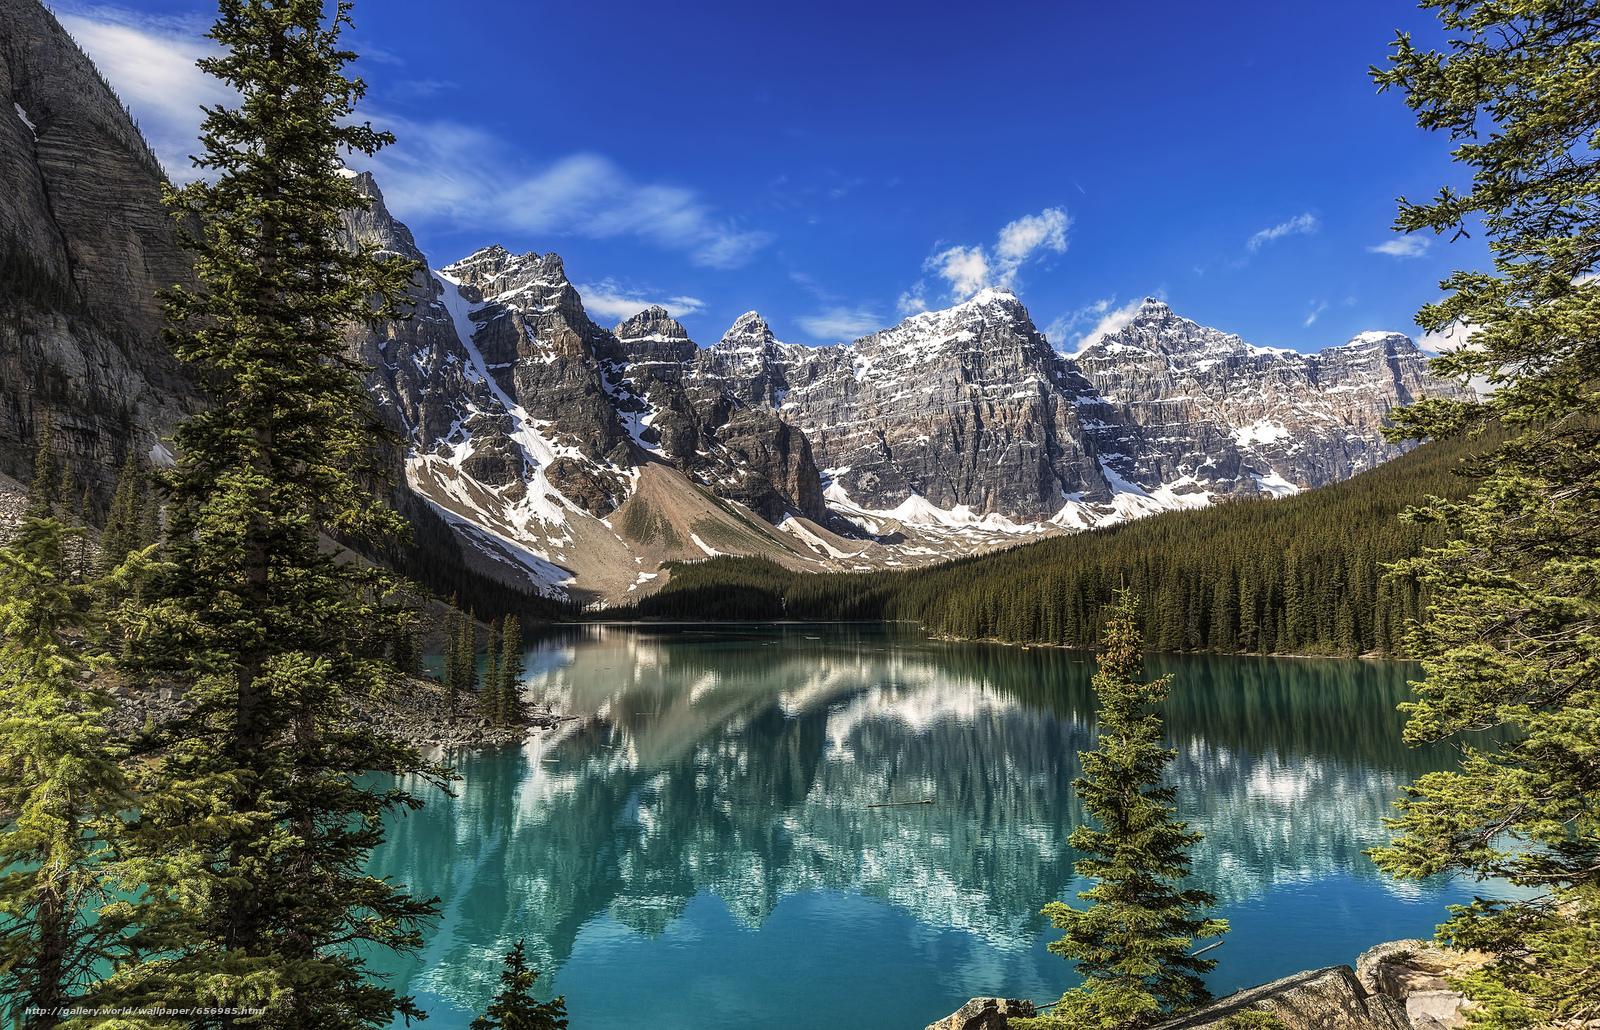 Download wallpaper Moraine Lake,  Banff National Park,  Alberta,  Canada free desktop wallpaper in the resolution 2048x1318 — picture №656985